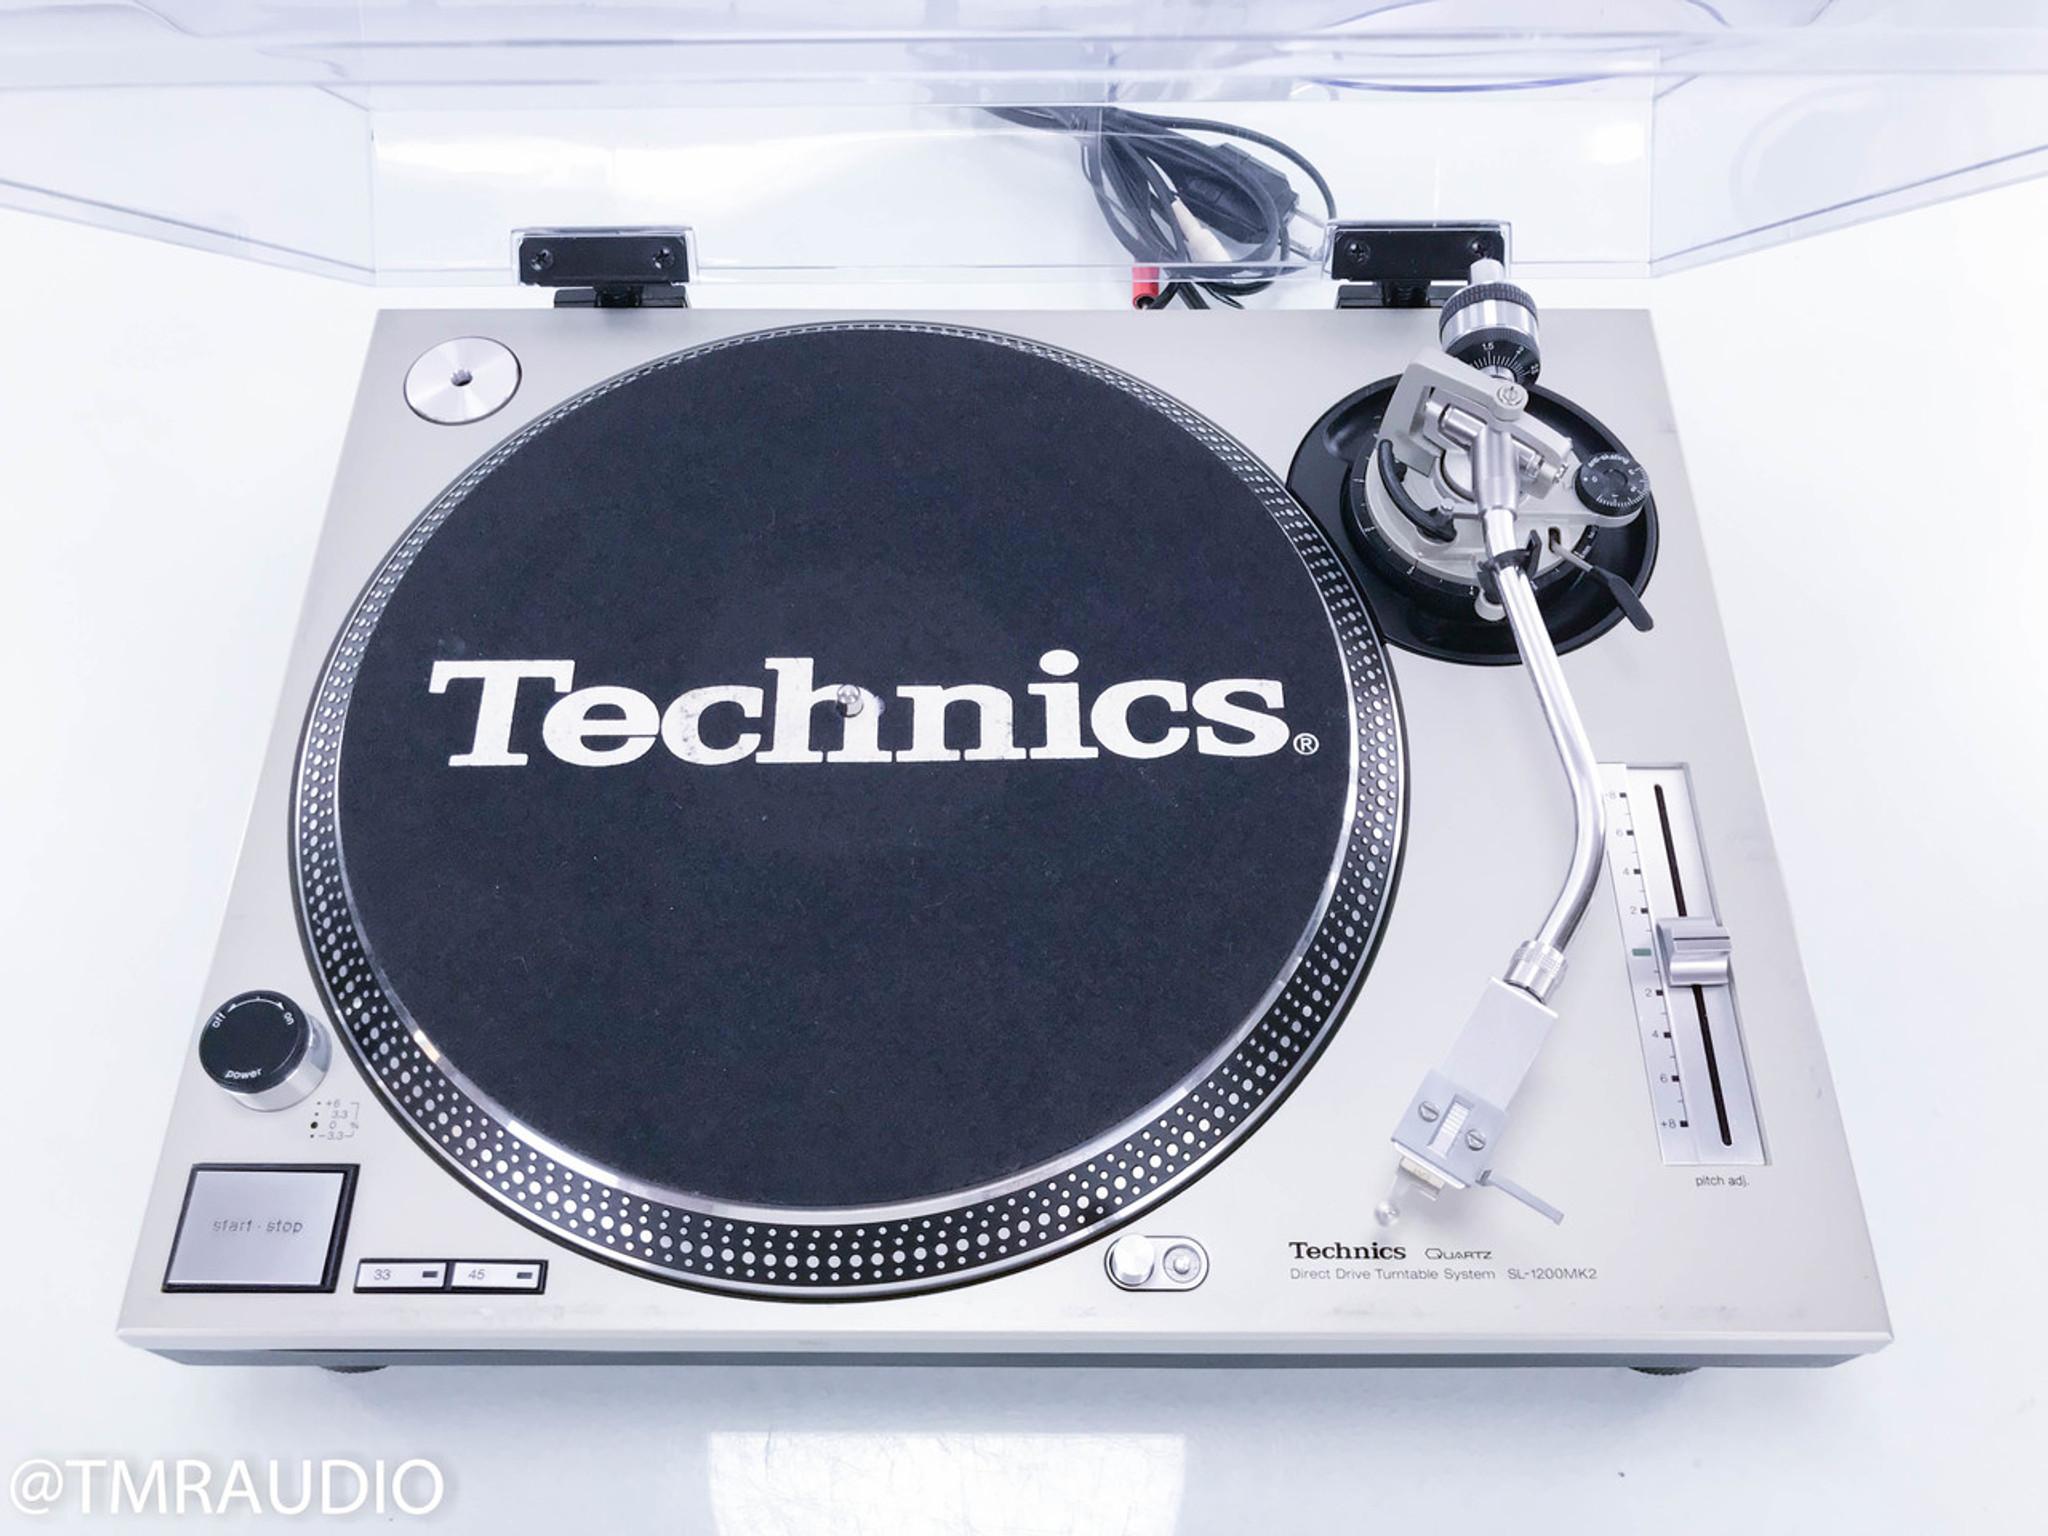 technics sl 1200mk2 turntable pickering xv 15 cartridge the music